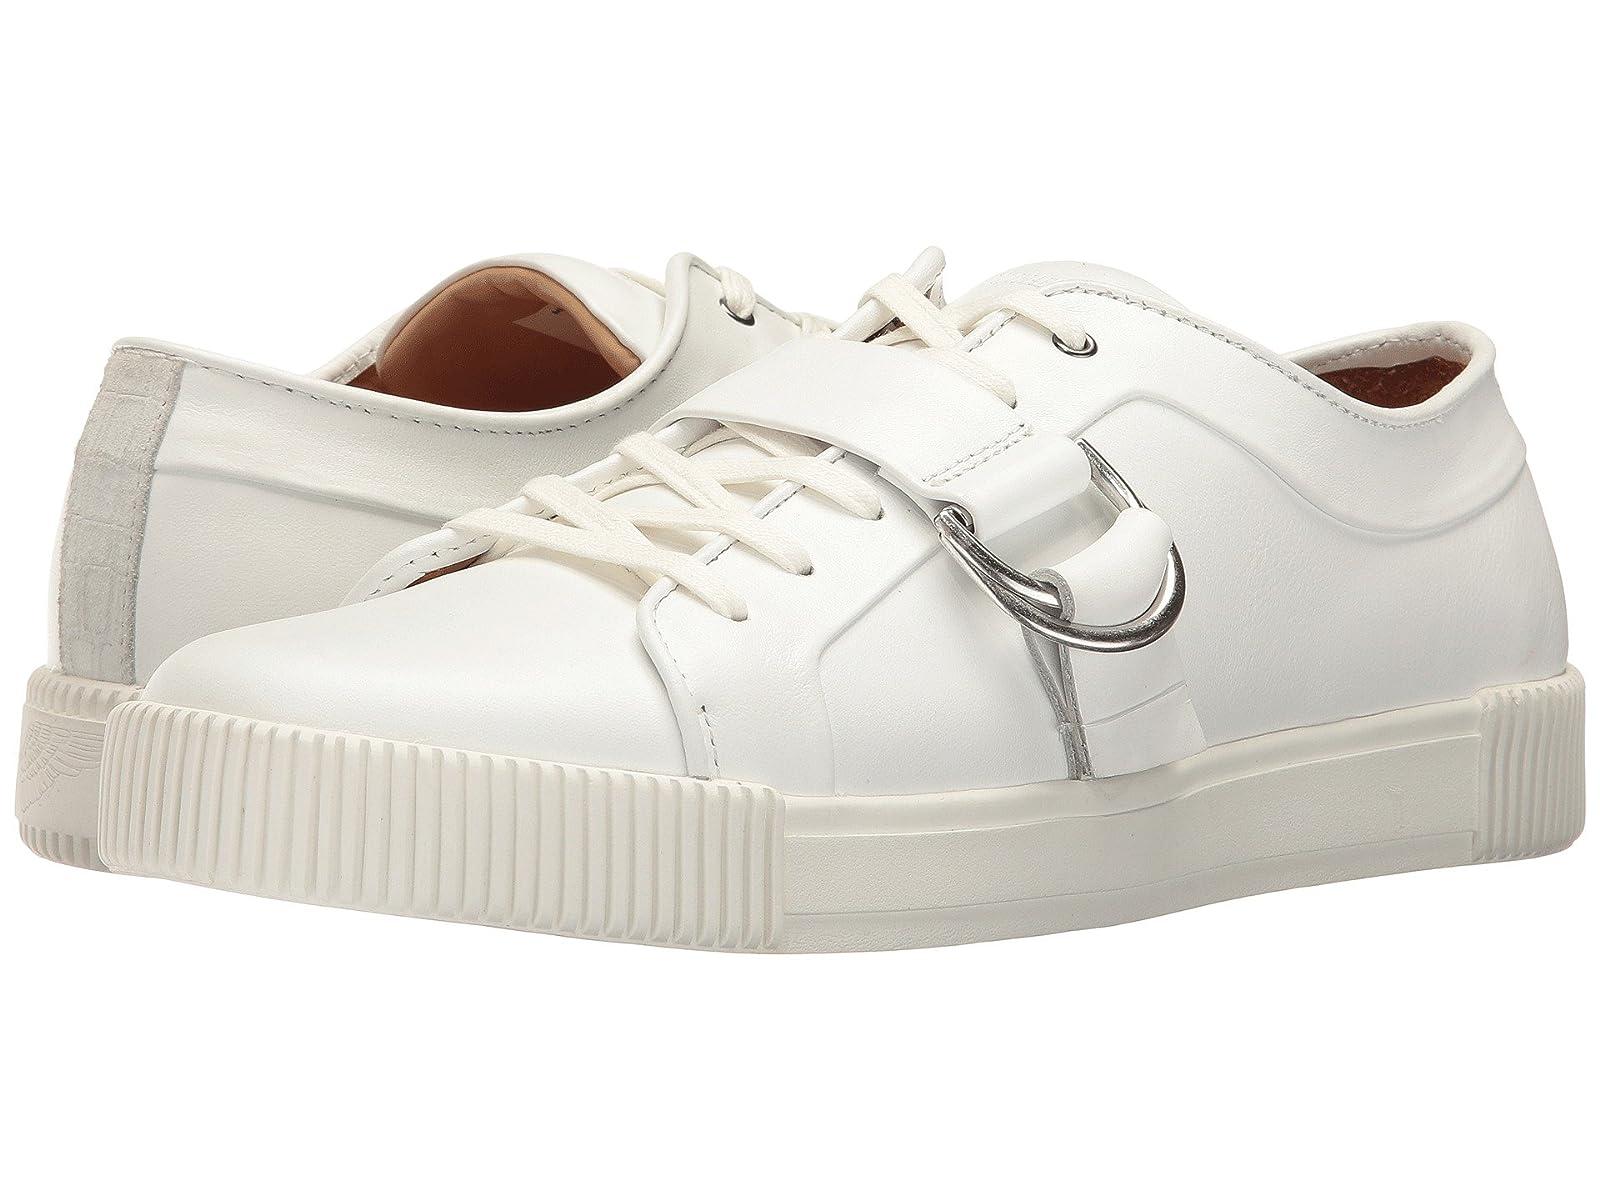 Michael Bastian Gray Label Lyons Low SneakerCheap and distinctive eye-catching shoes